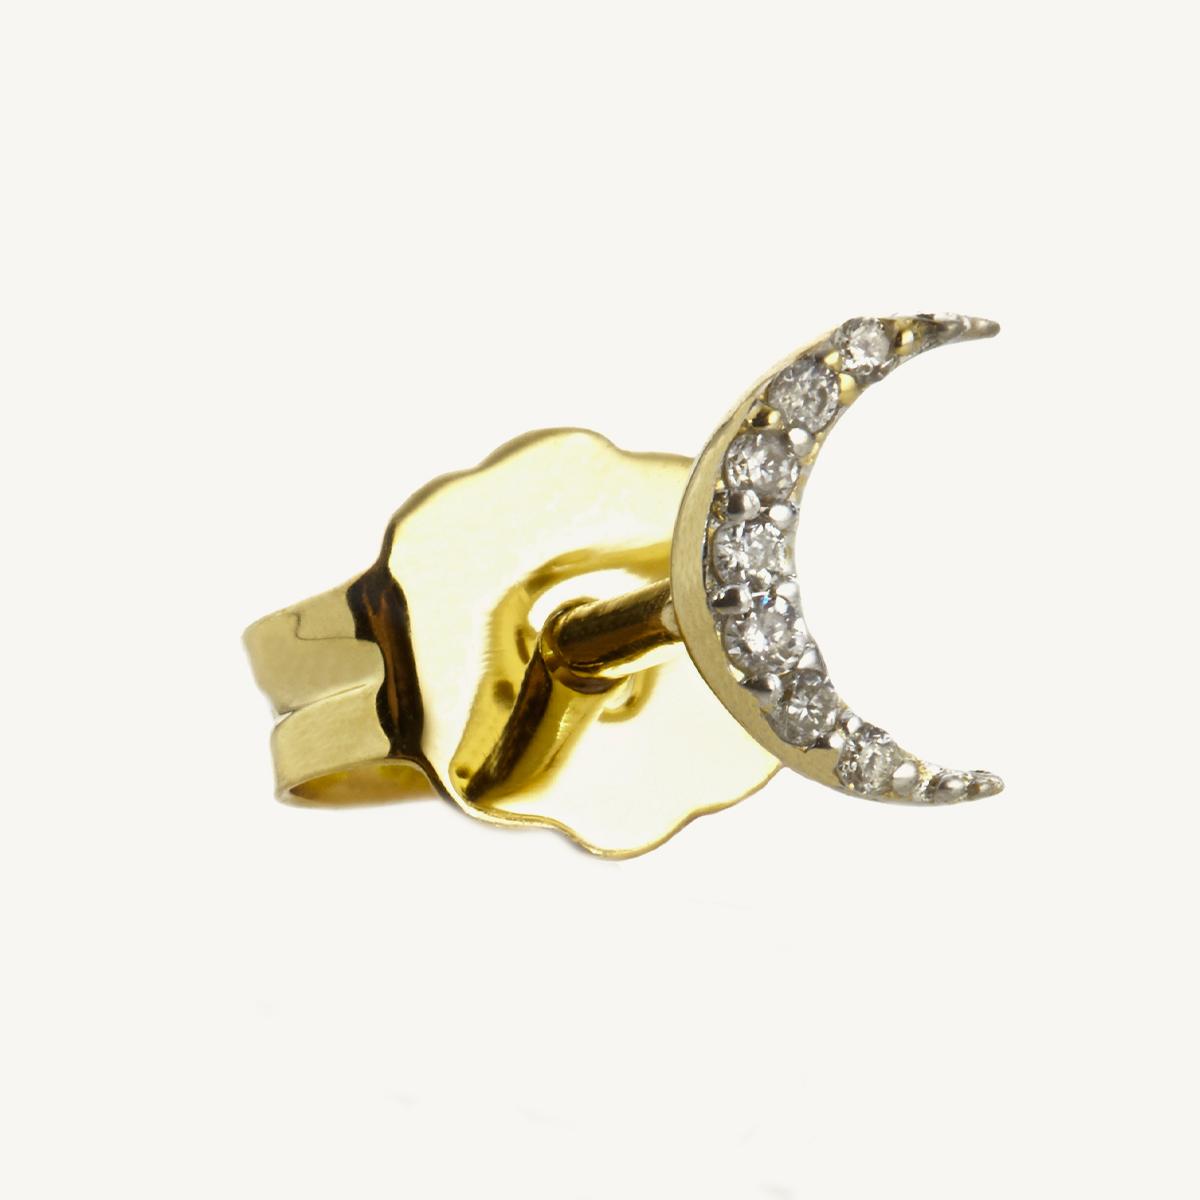 Earring Moon Stud in yellow gold